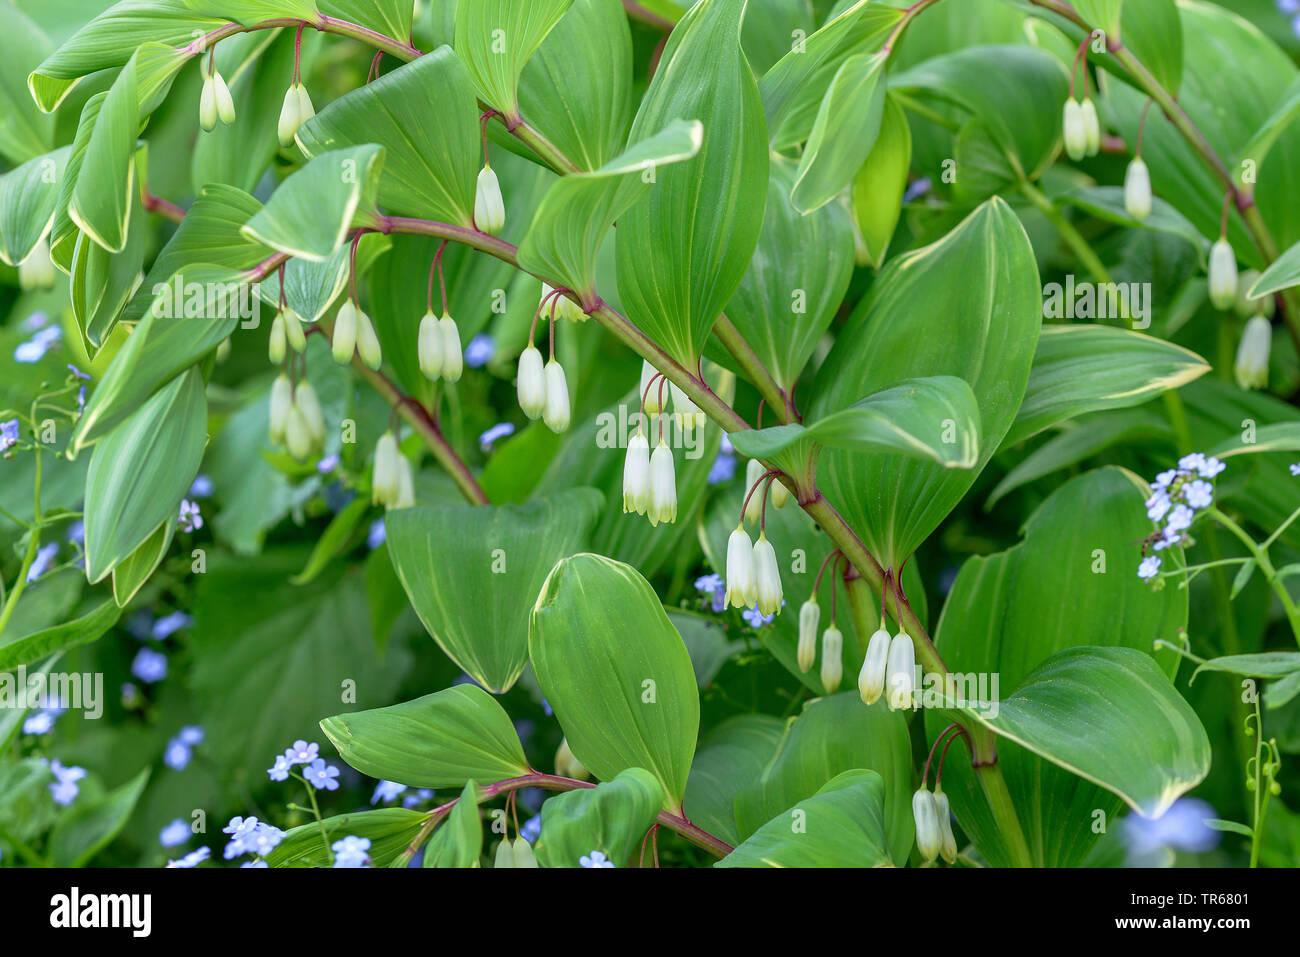 Cultivar Variegatum Stock Photos & Cultivar Variegatum Stock